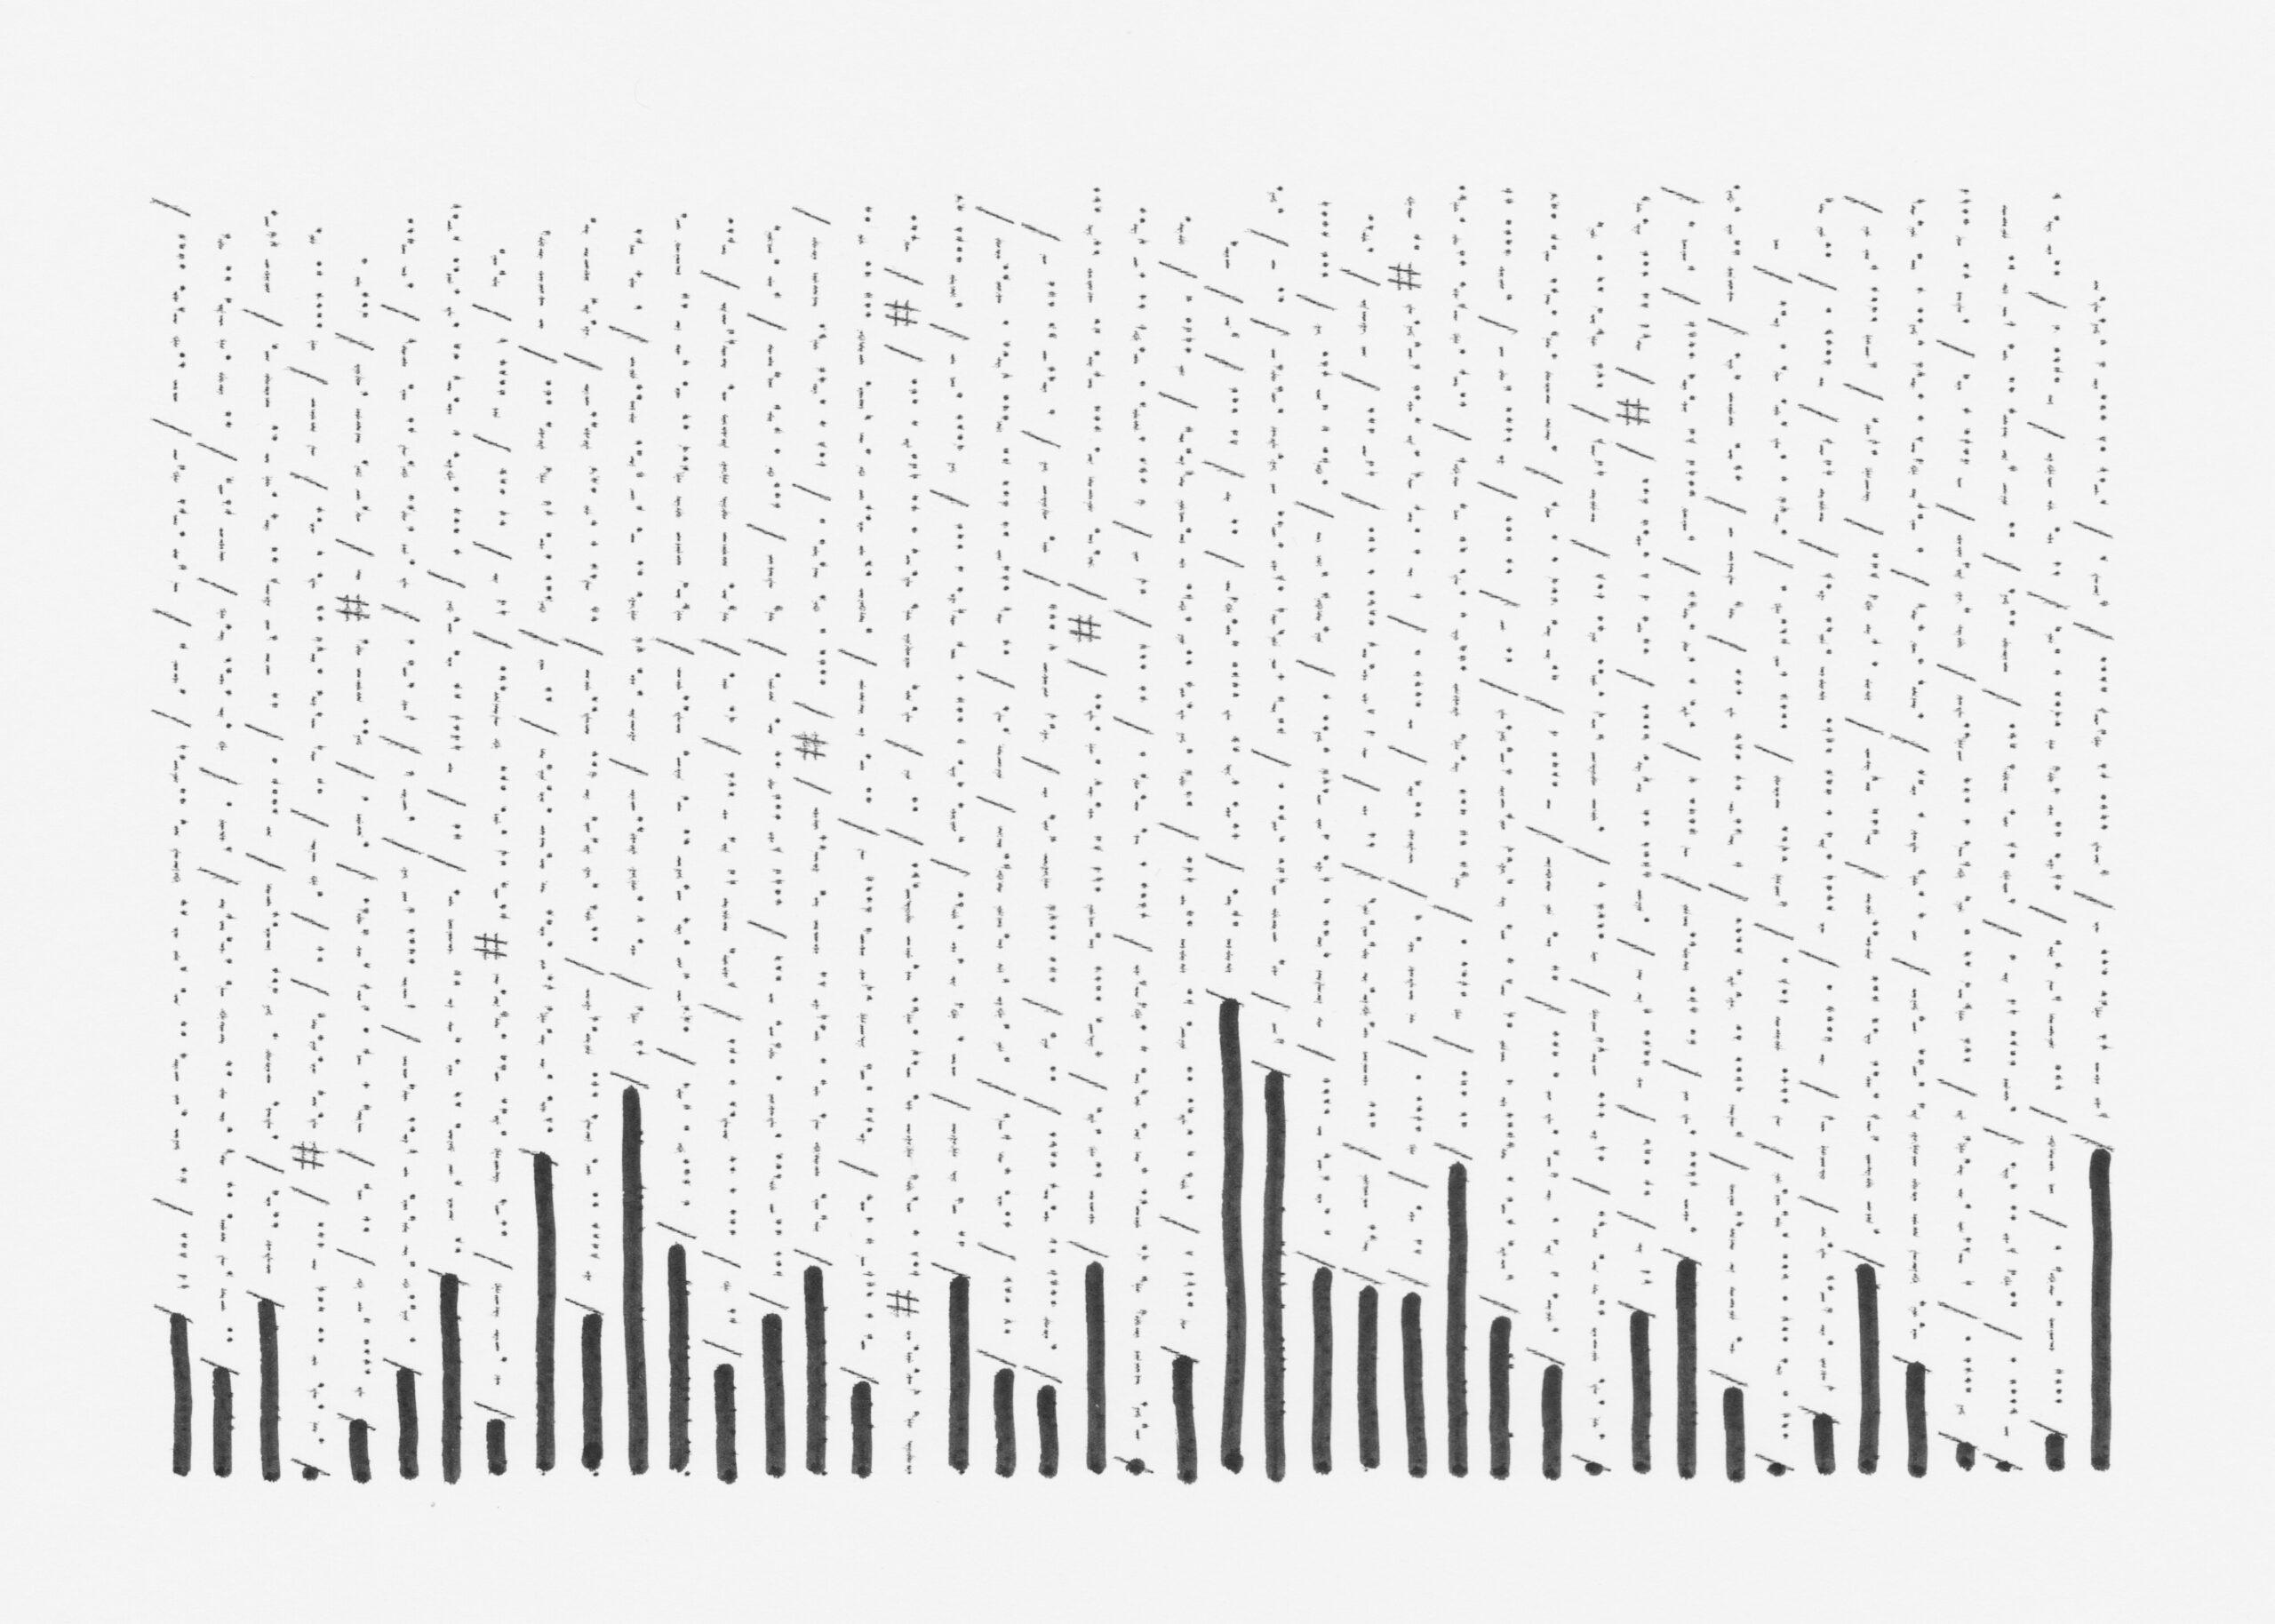 A_2020_04_23_scans_total_morseknittingScan-4